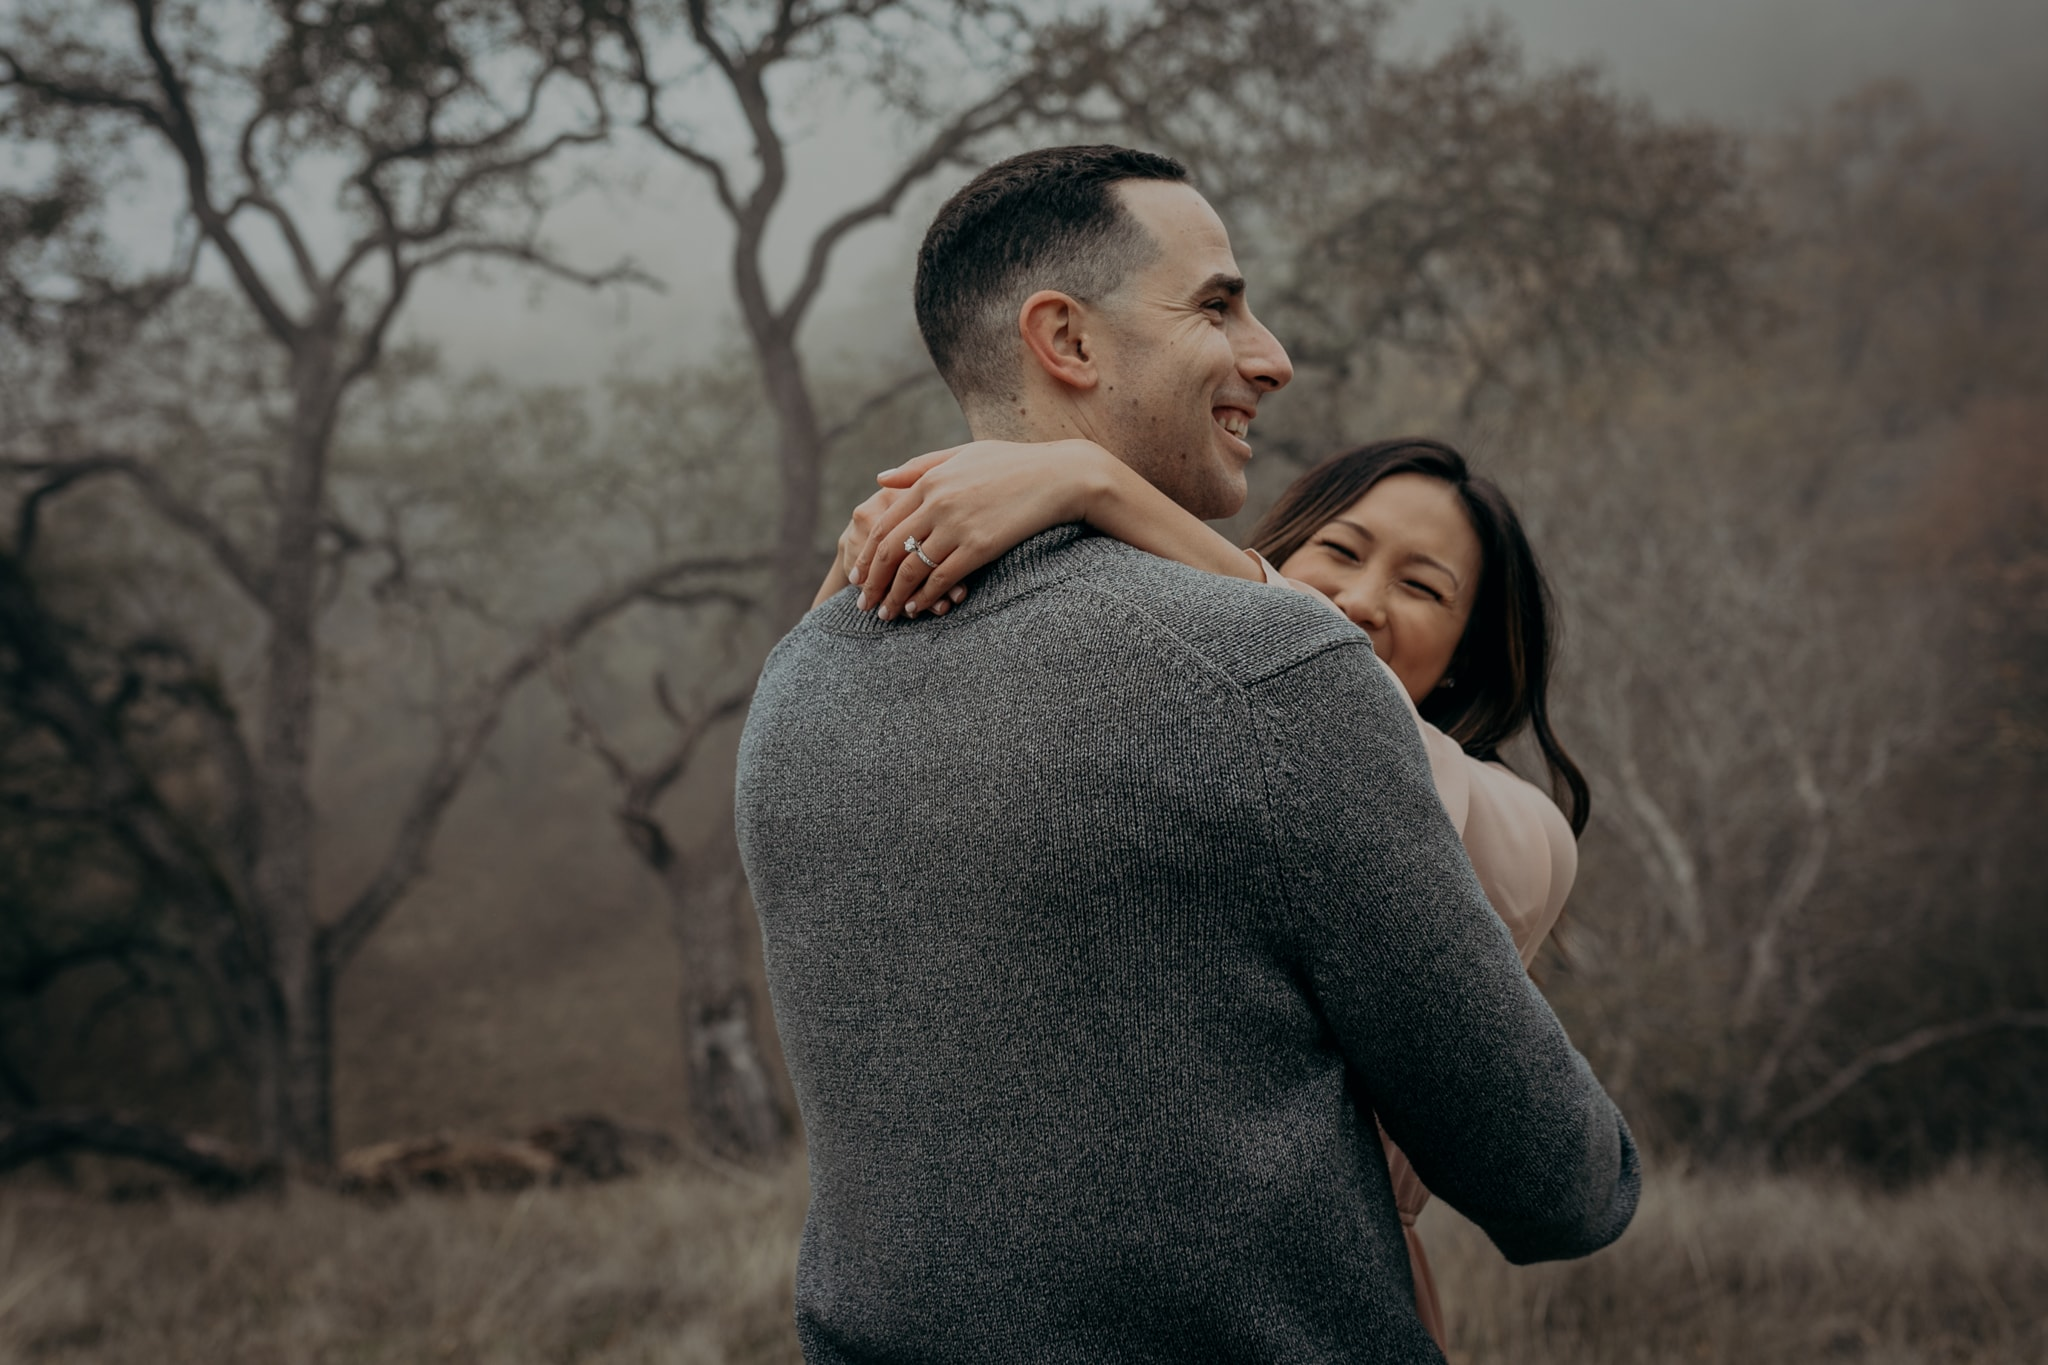 Walnut Creek Engagement Session Couple happy Smiling